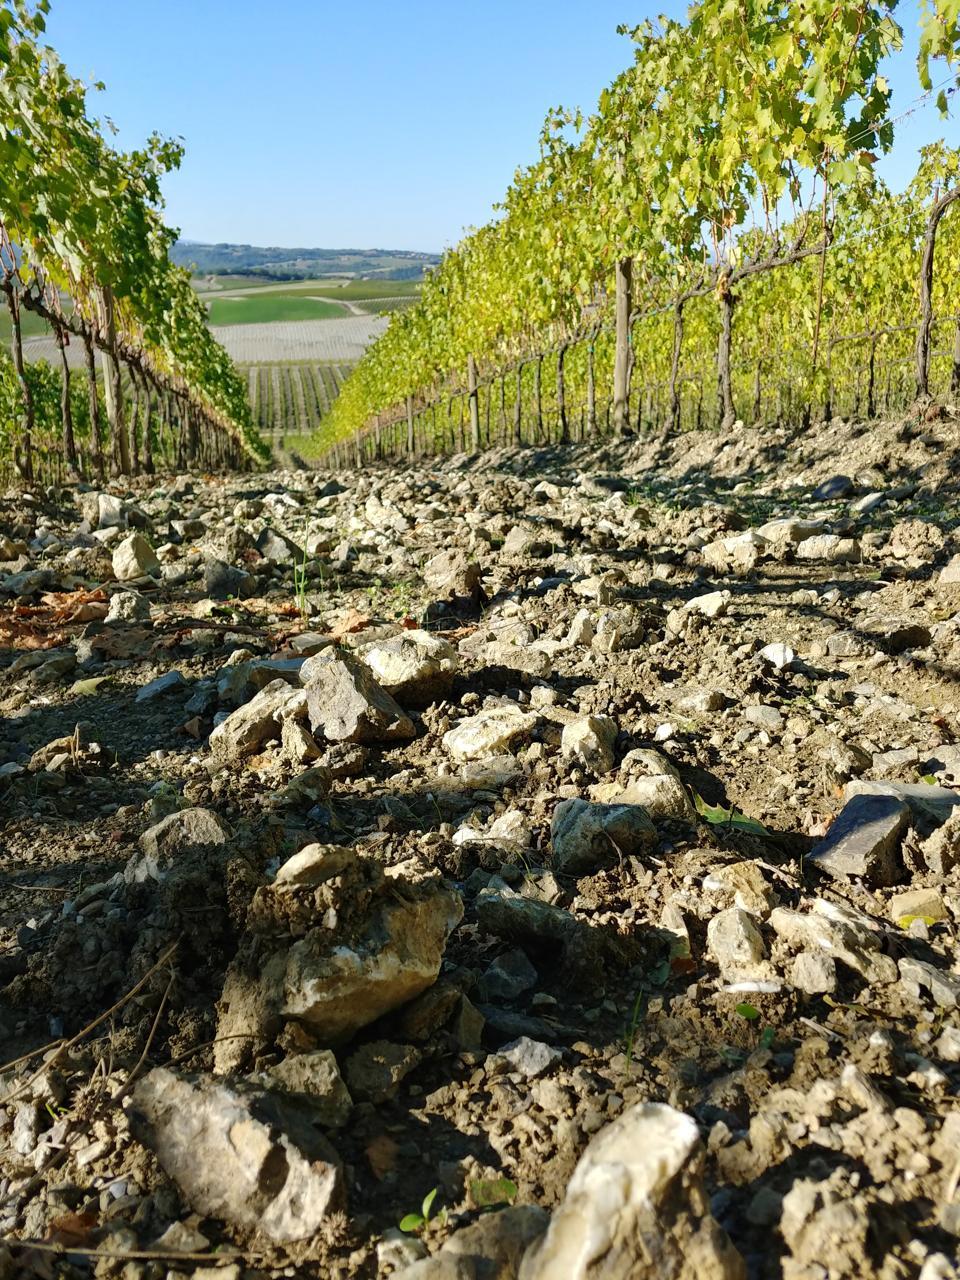 Montosoli Vineyards in Montalcino, Tuscany, Italy - Brunello di Montalcino